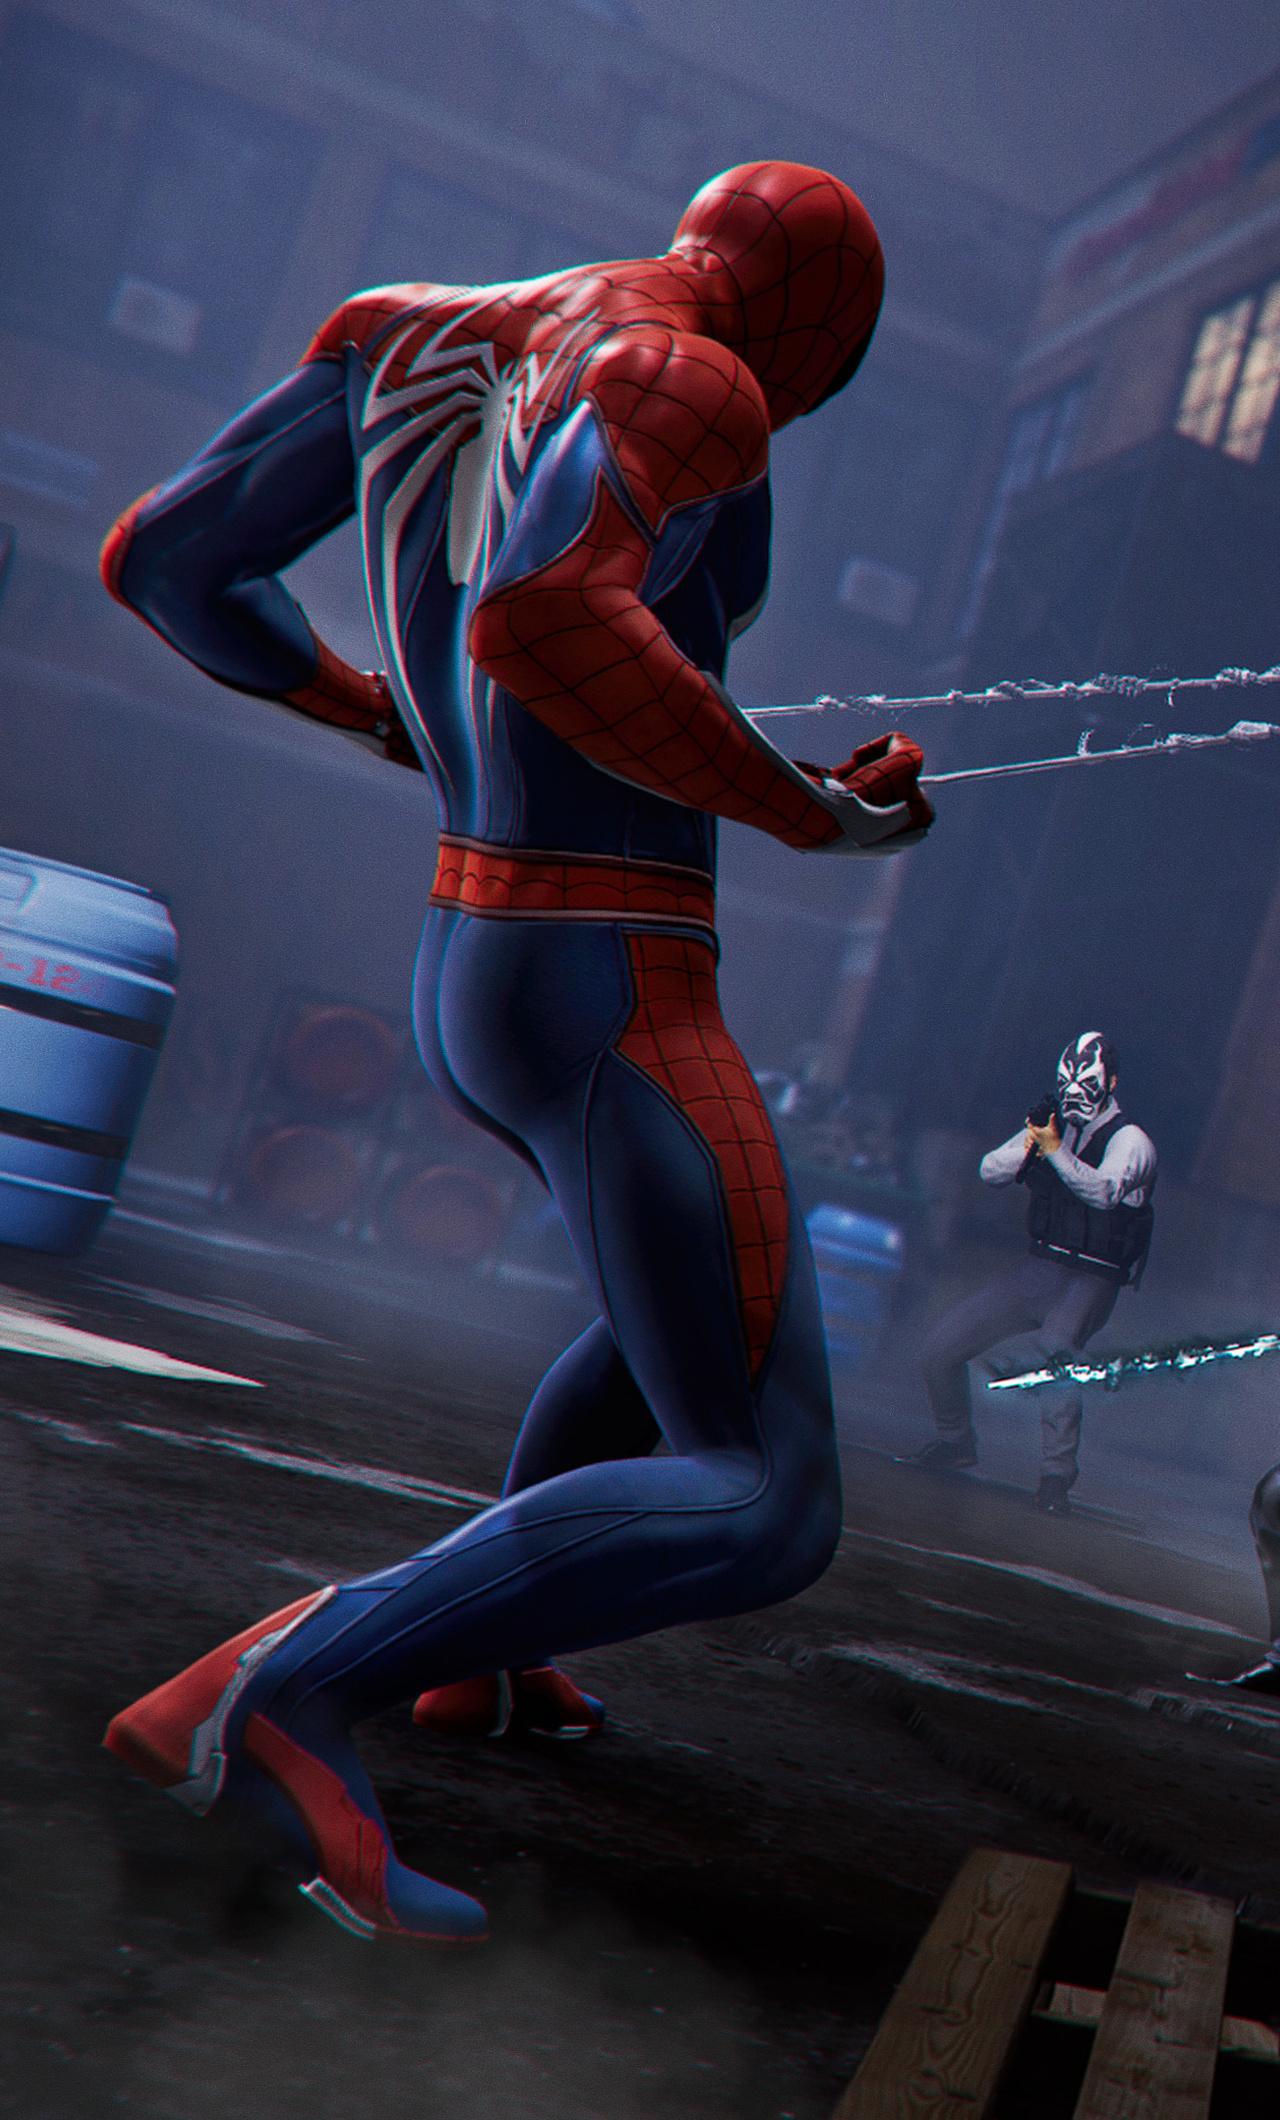 Iphone 4k Resolution Spiderman Ps4 Wallpaper